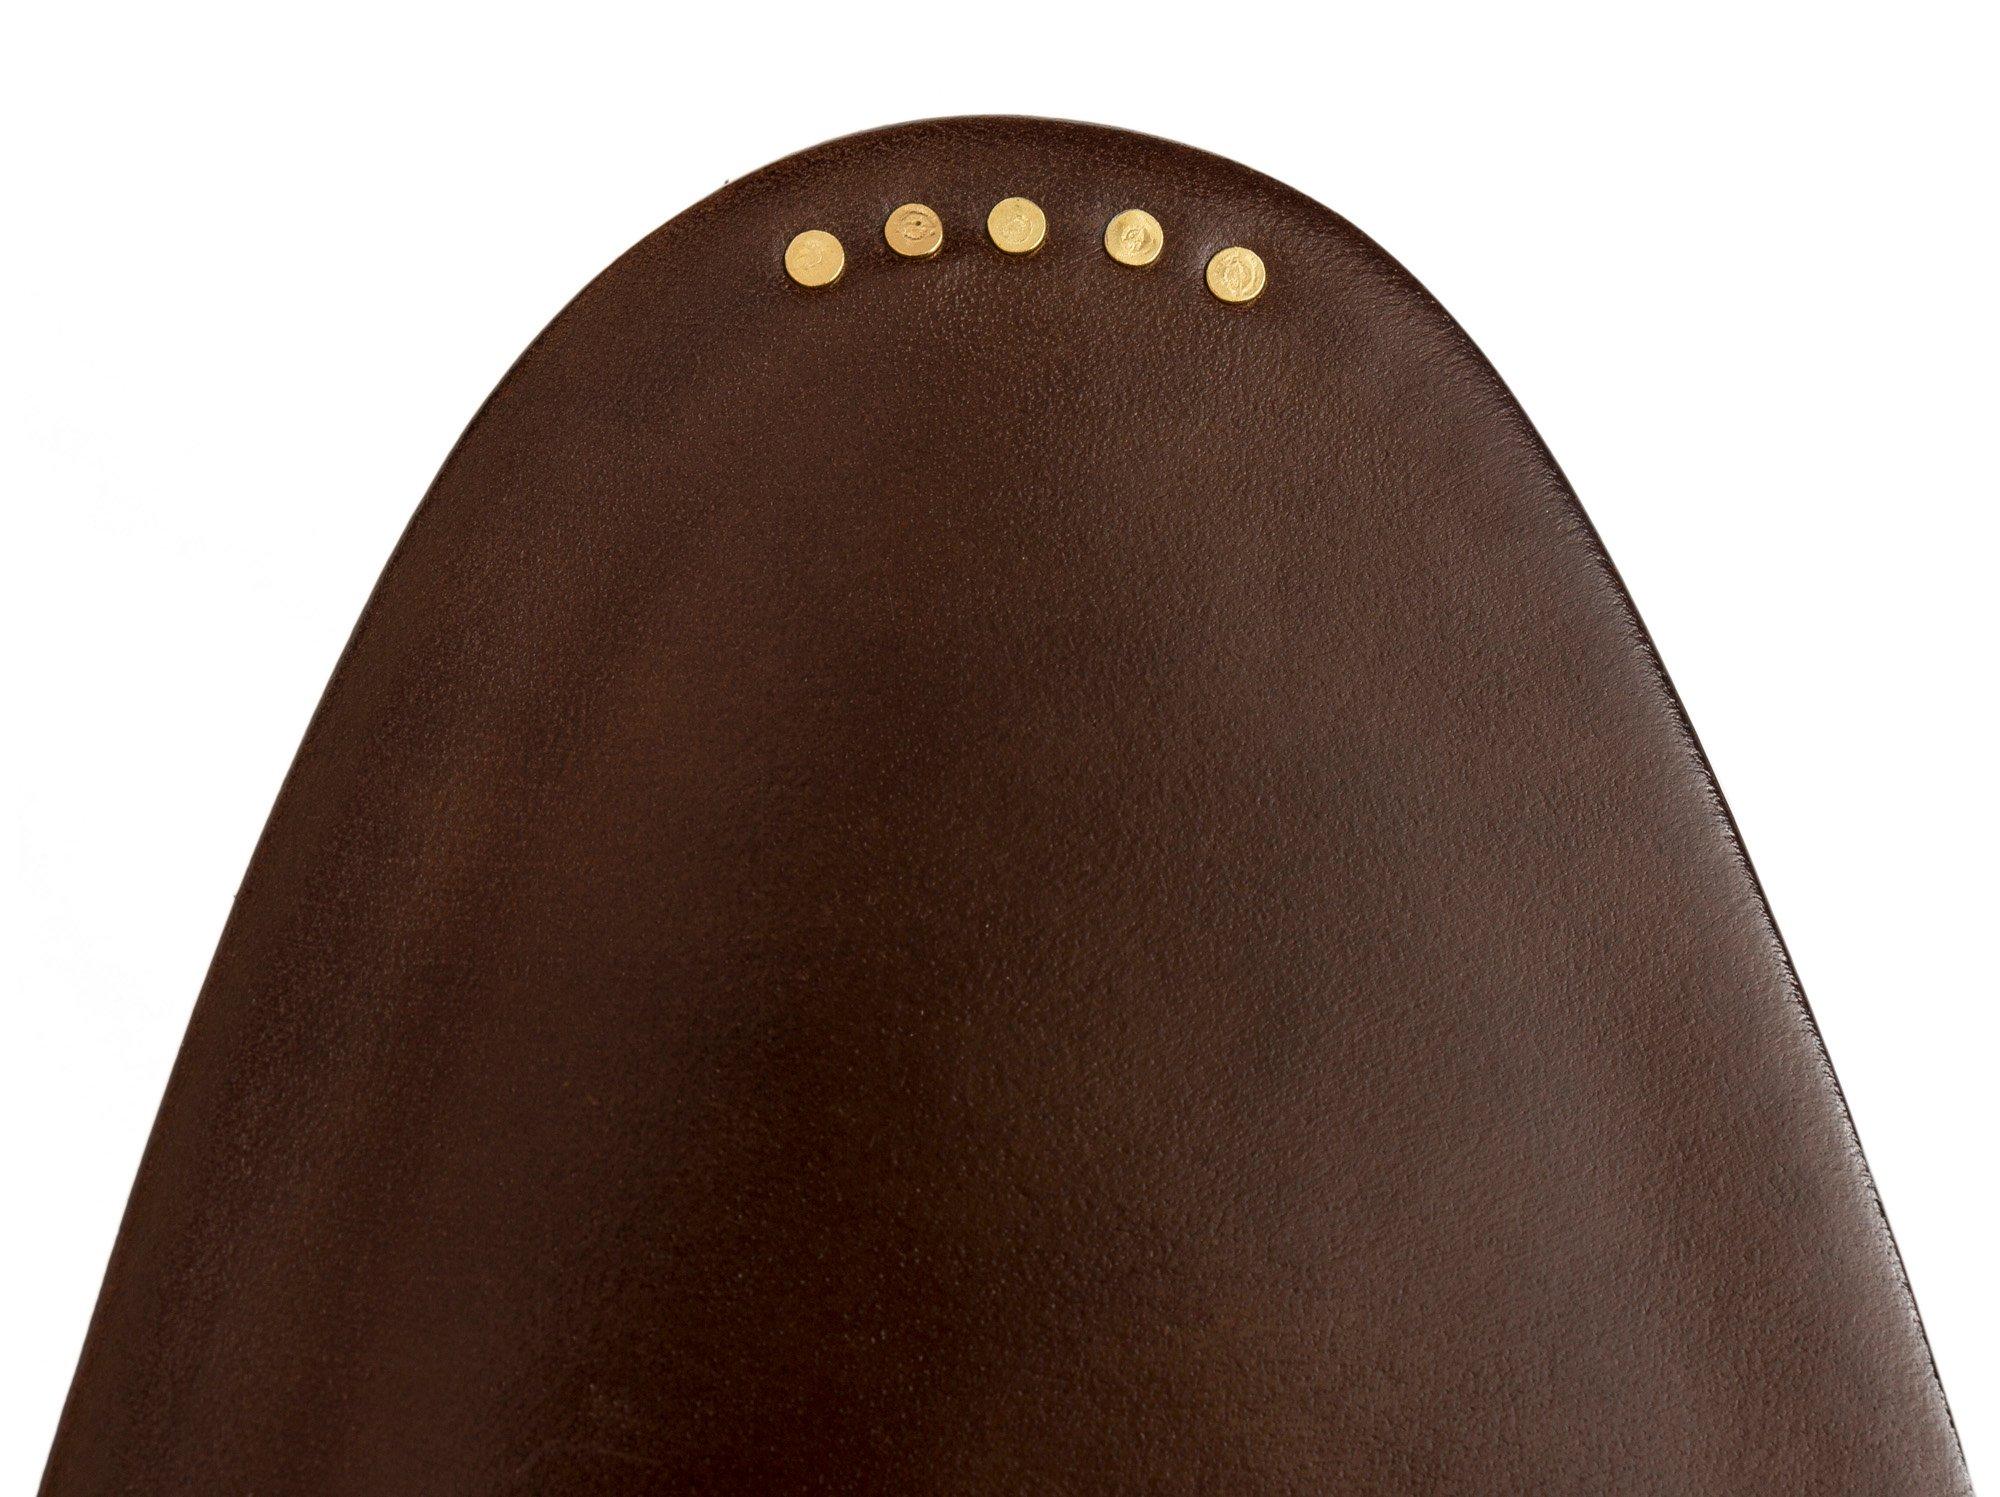 Discover the Kent Double Monk- J.FitzPatrick Footwear